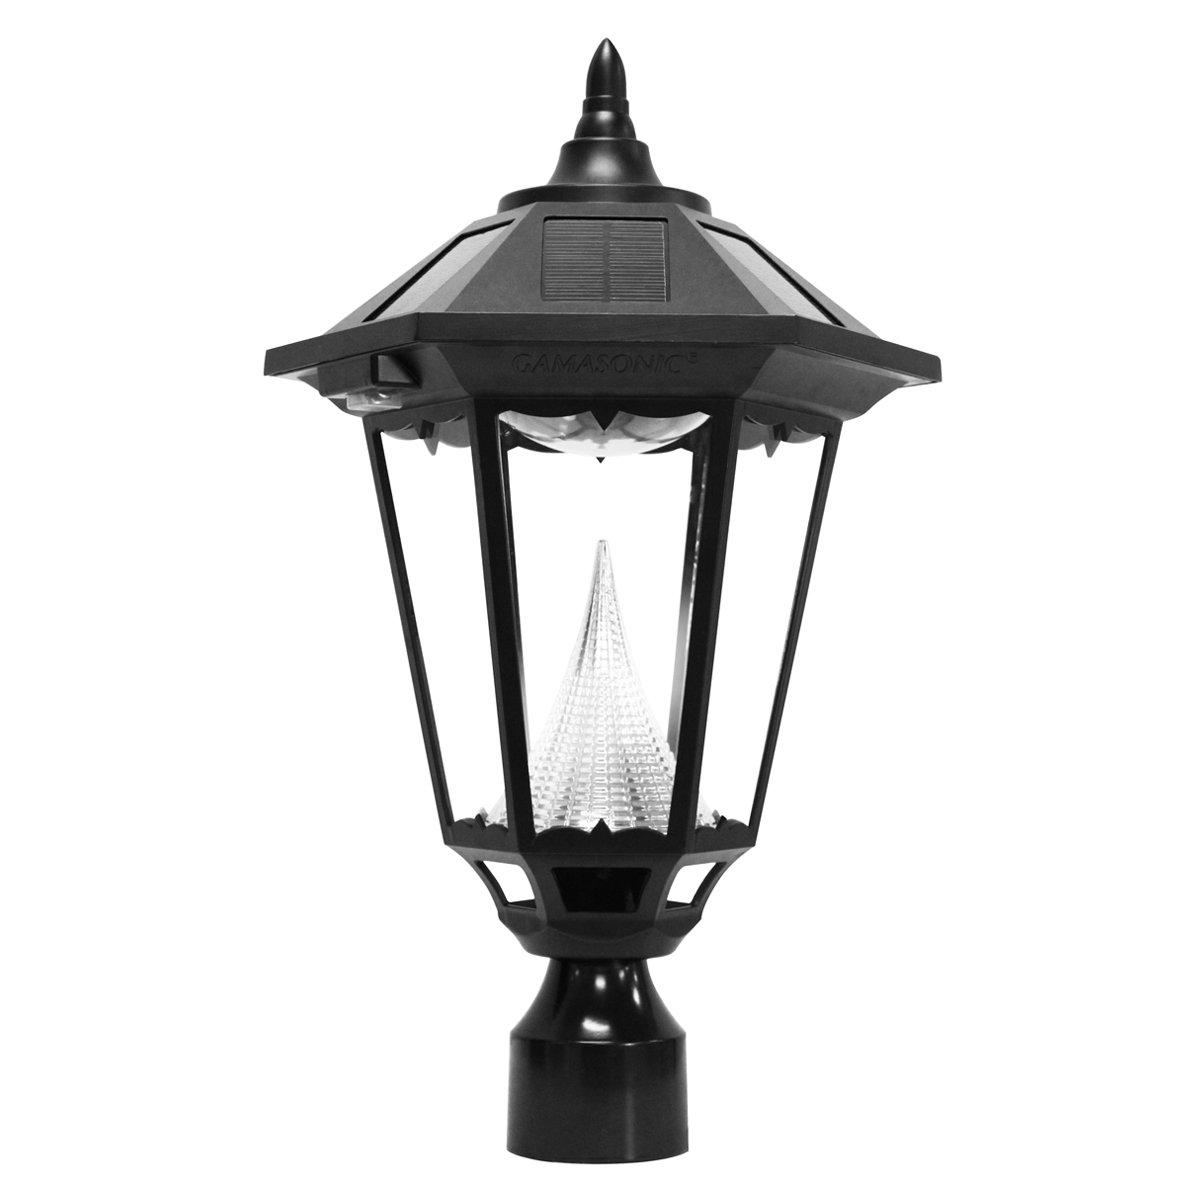 Amazon.com : Gama Sonic Windsor Solar Outdoor Post Light - Black Finish  GS-99F : Landscape Path Lights : Garden & Outdoor